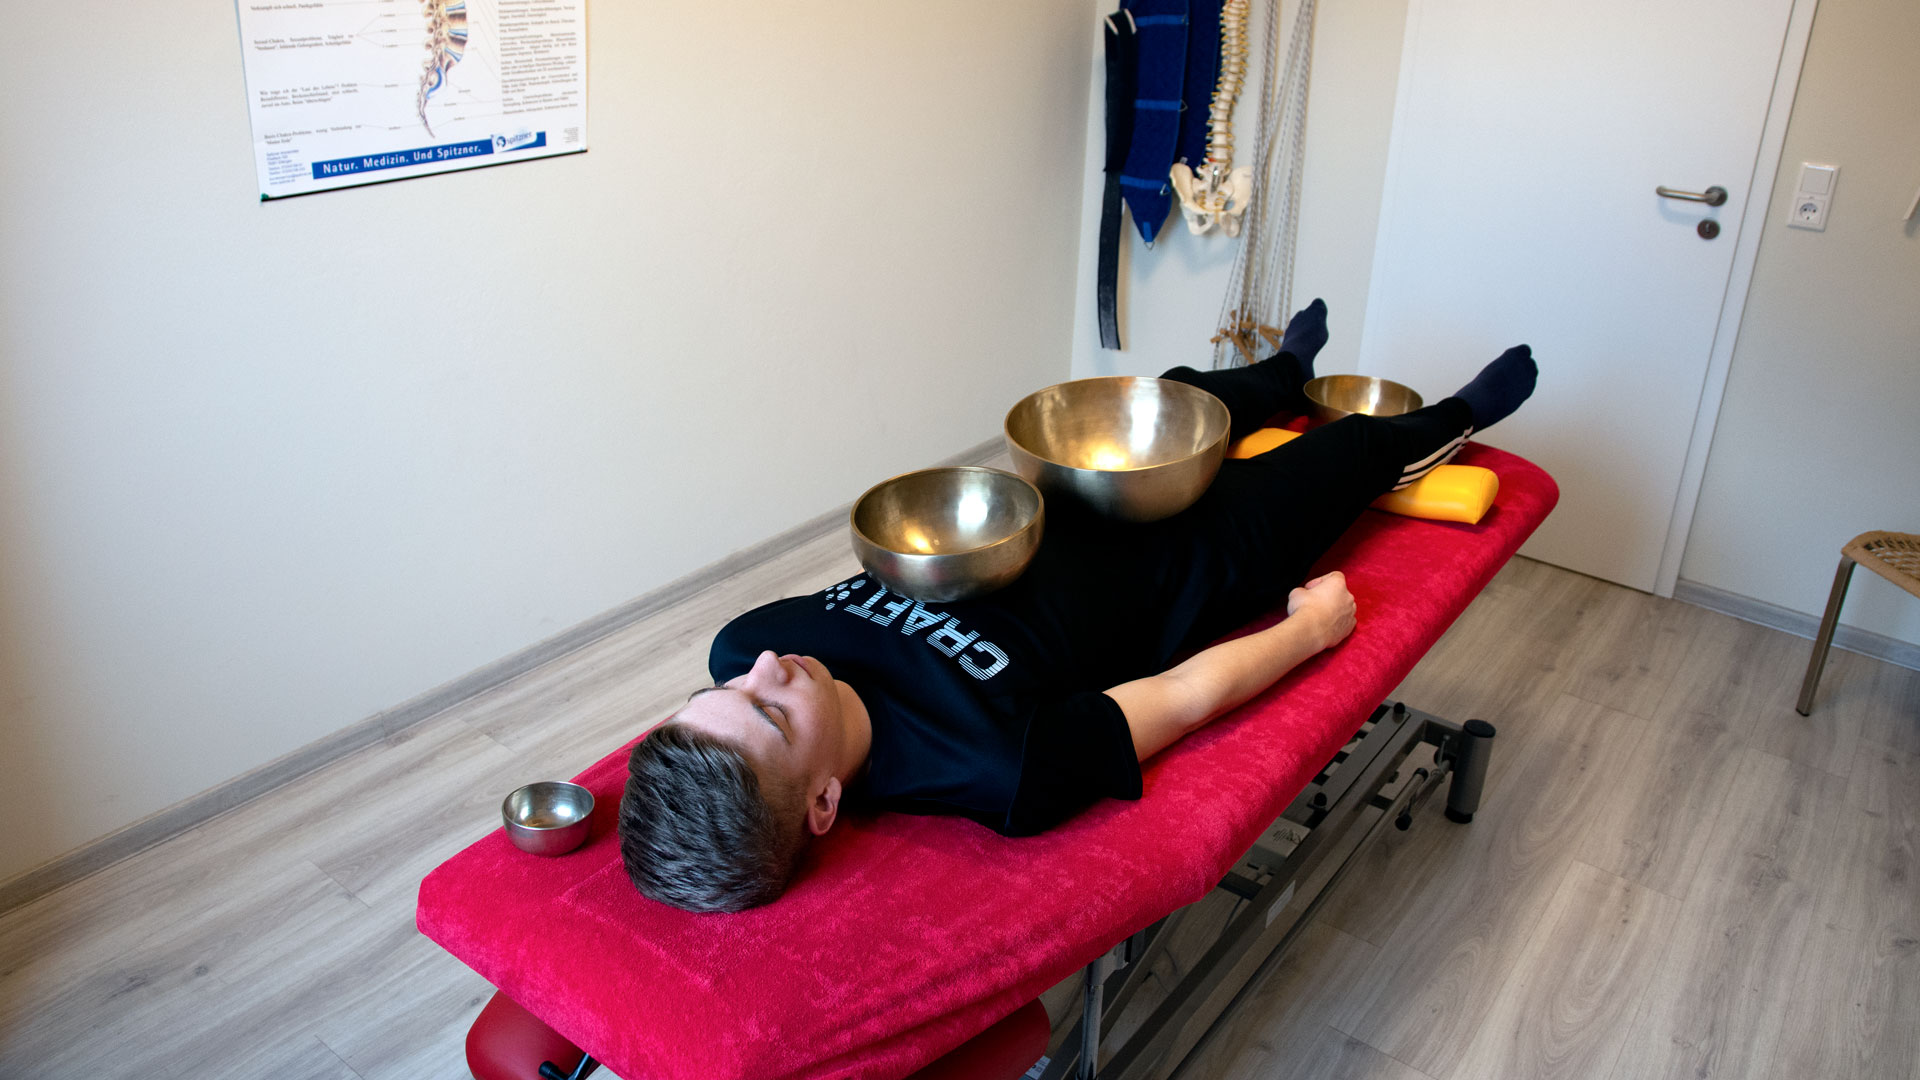 rhoenfit_physiotherapie_bertsch_020319_04